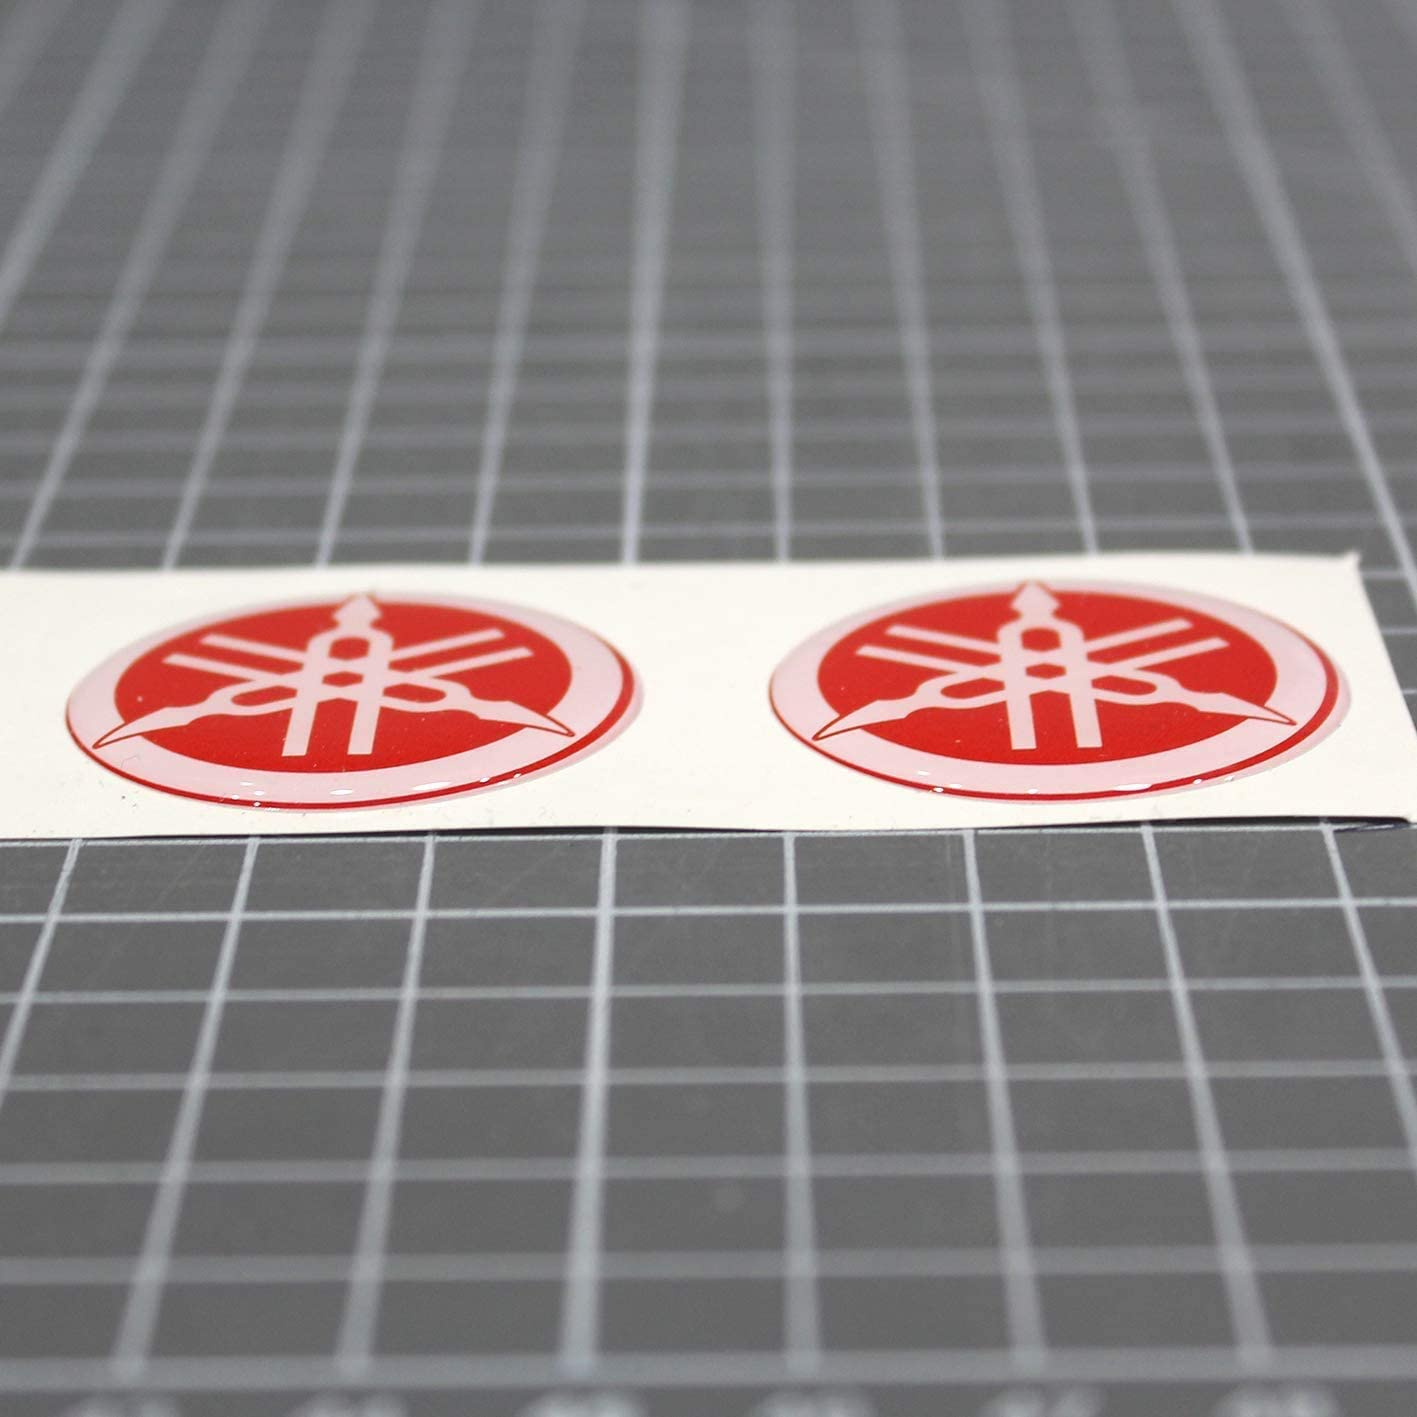 effetto 3D GOMMATO 2 Adesivi resinati N Stemma logo decal YAMAHA kit da 2 pezzi diapason- per SERBATOIO o CASCO